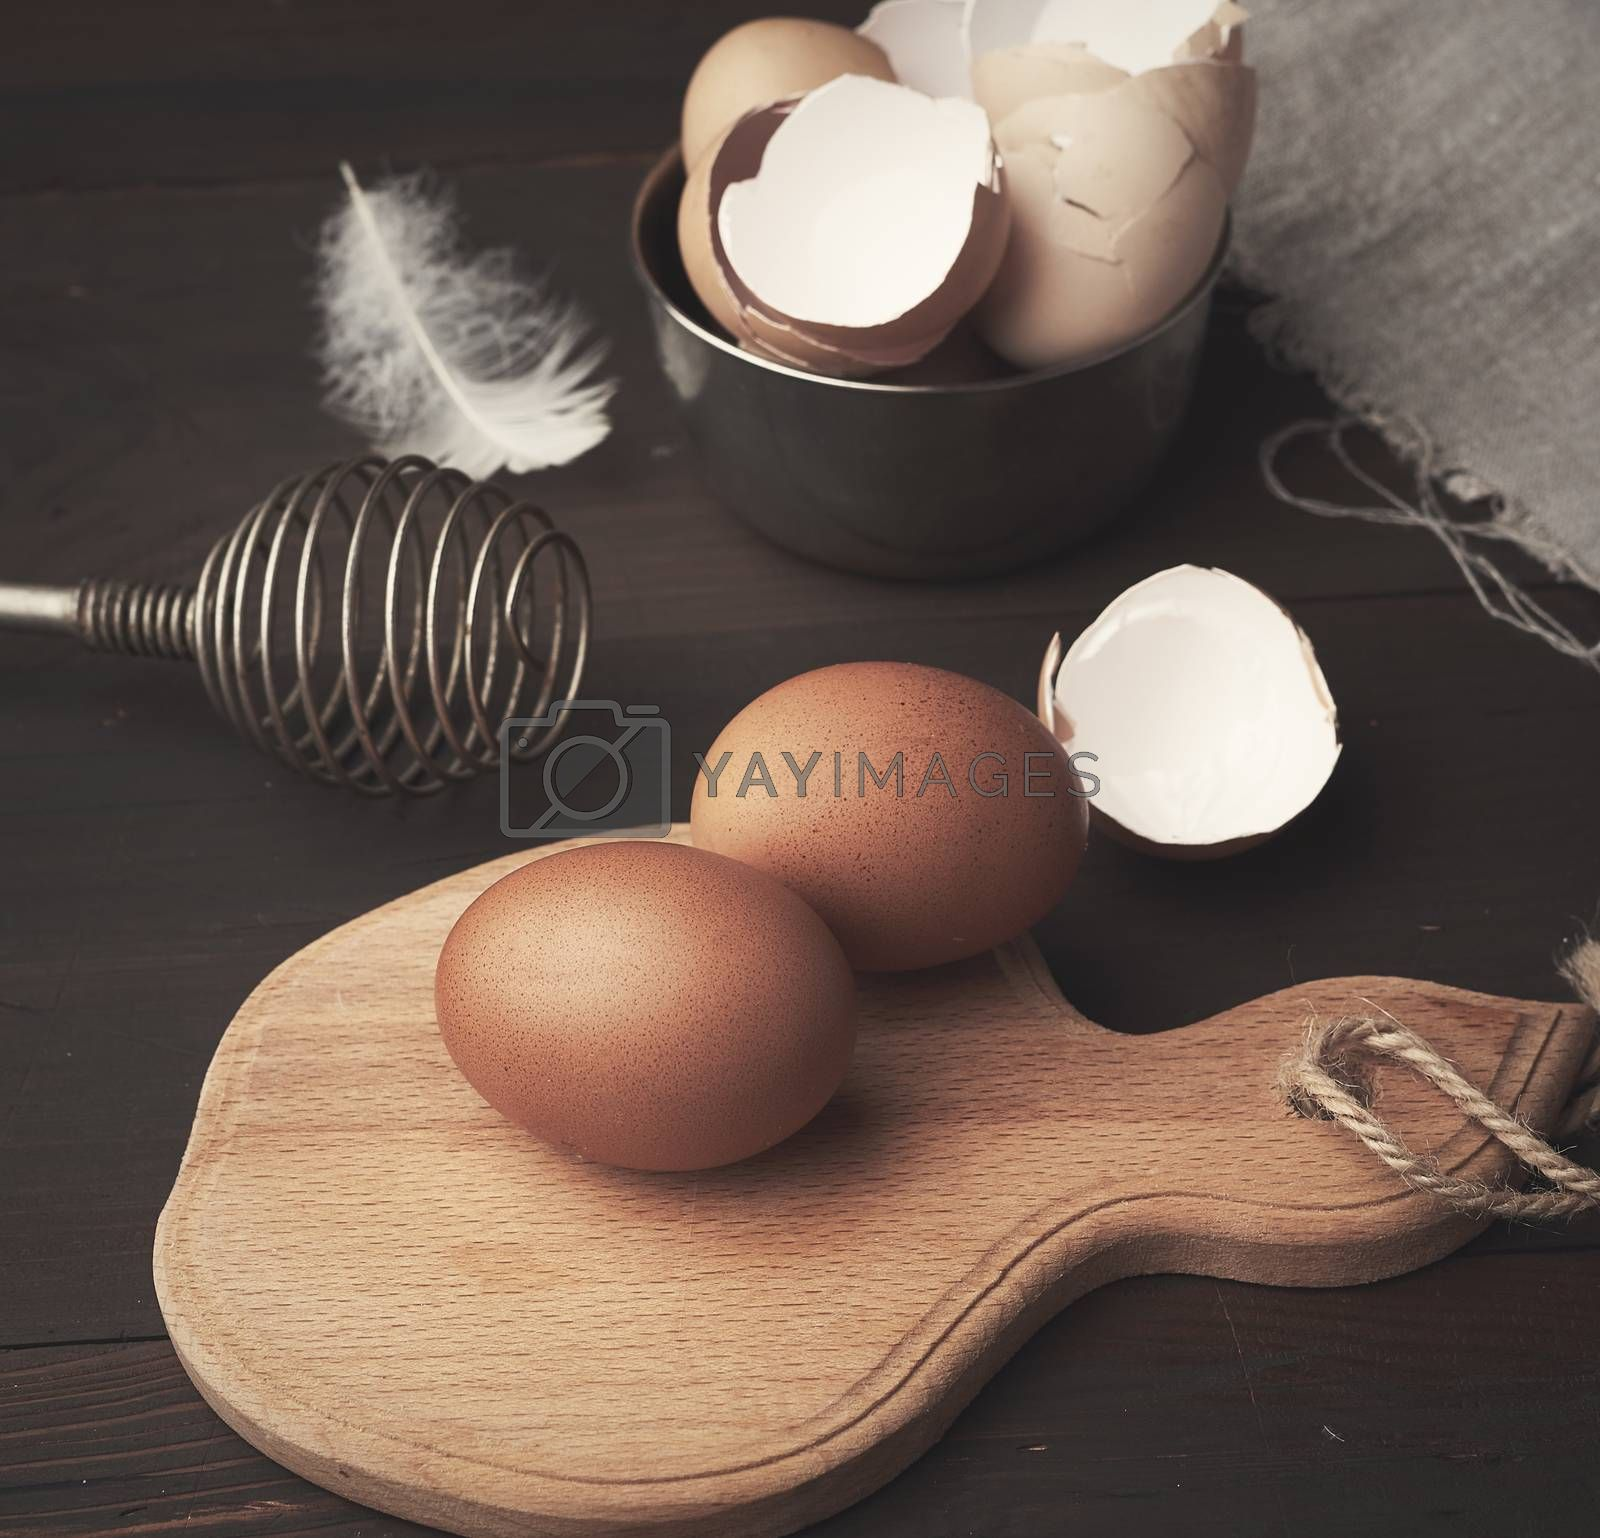 brown whole chicken eggs on a wooden board by ndanko